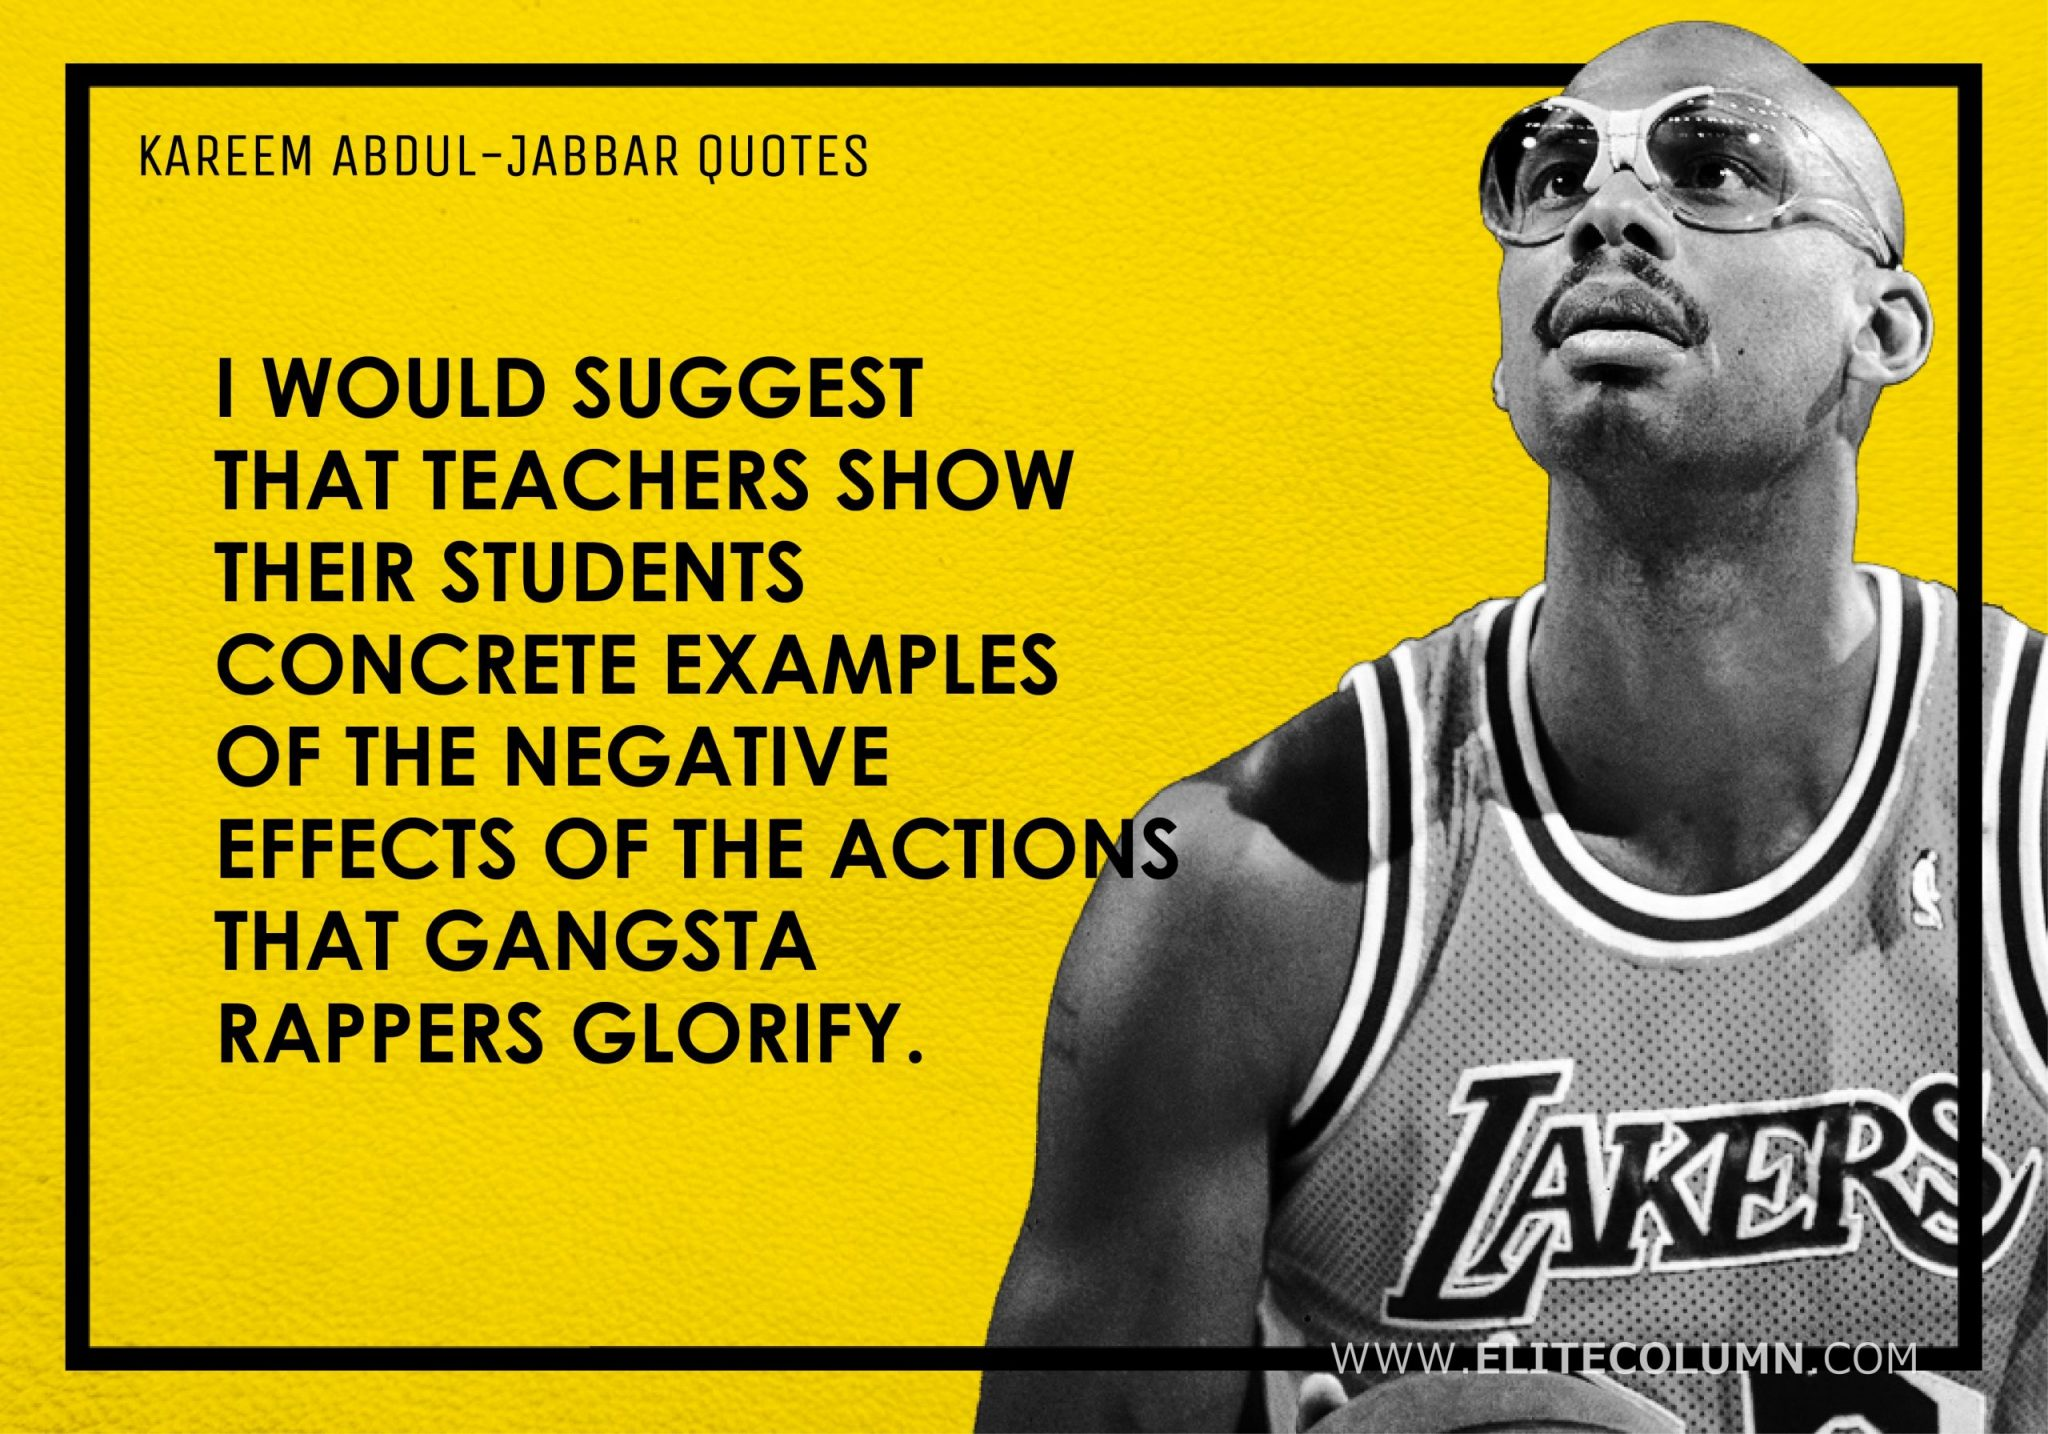 Kareem Abdul-Jabbar Quotes (8)